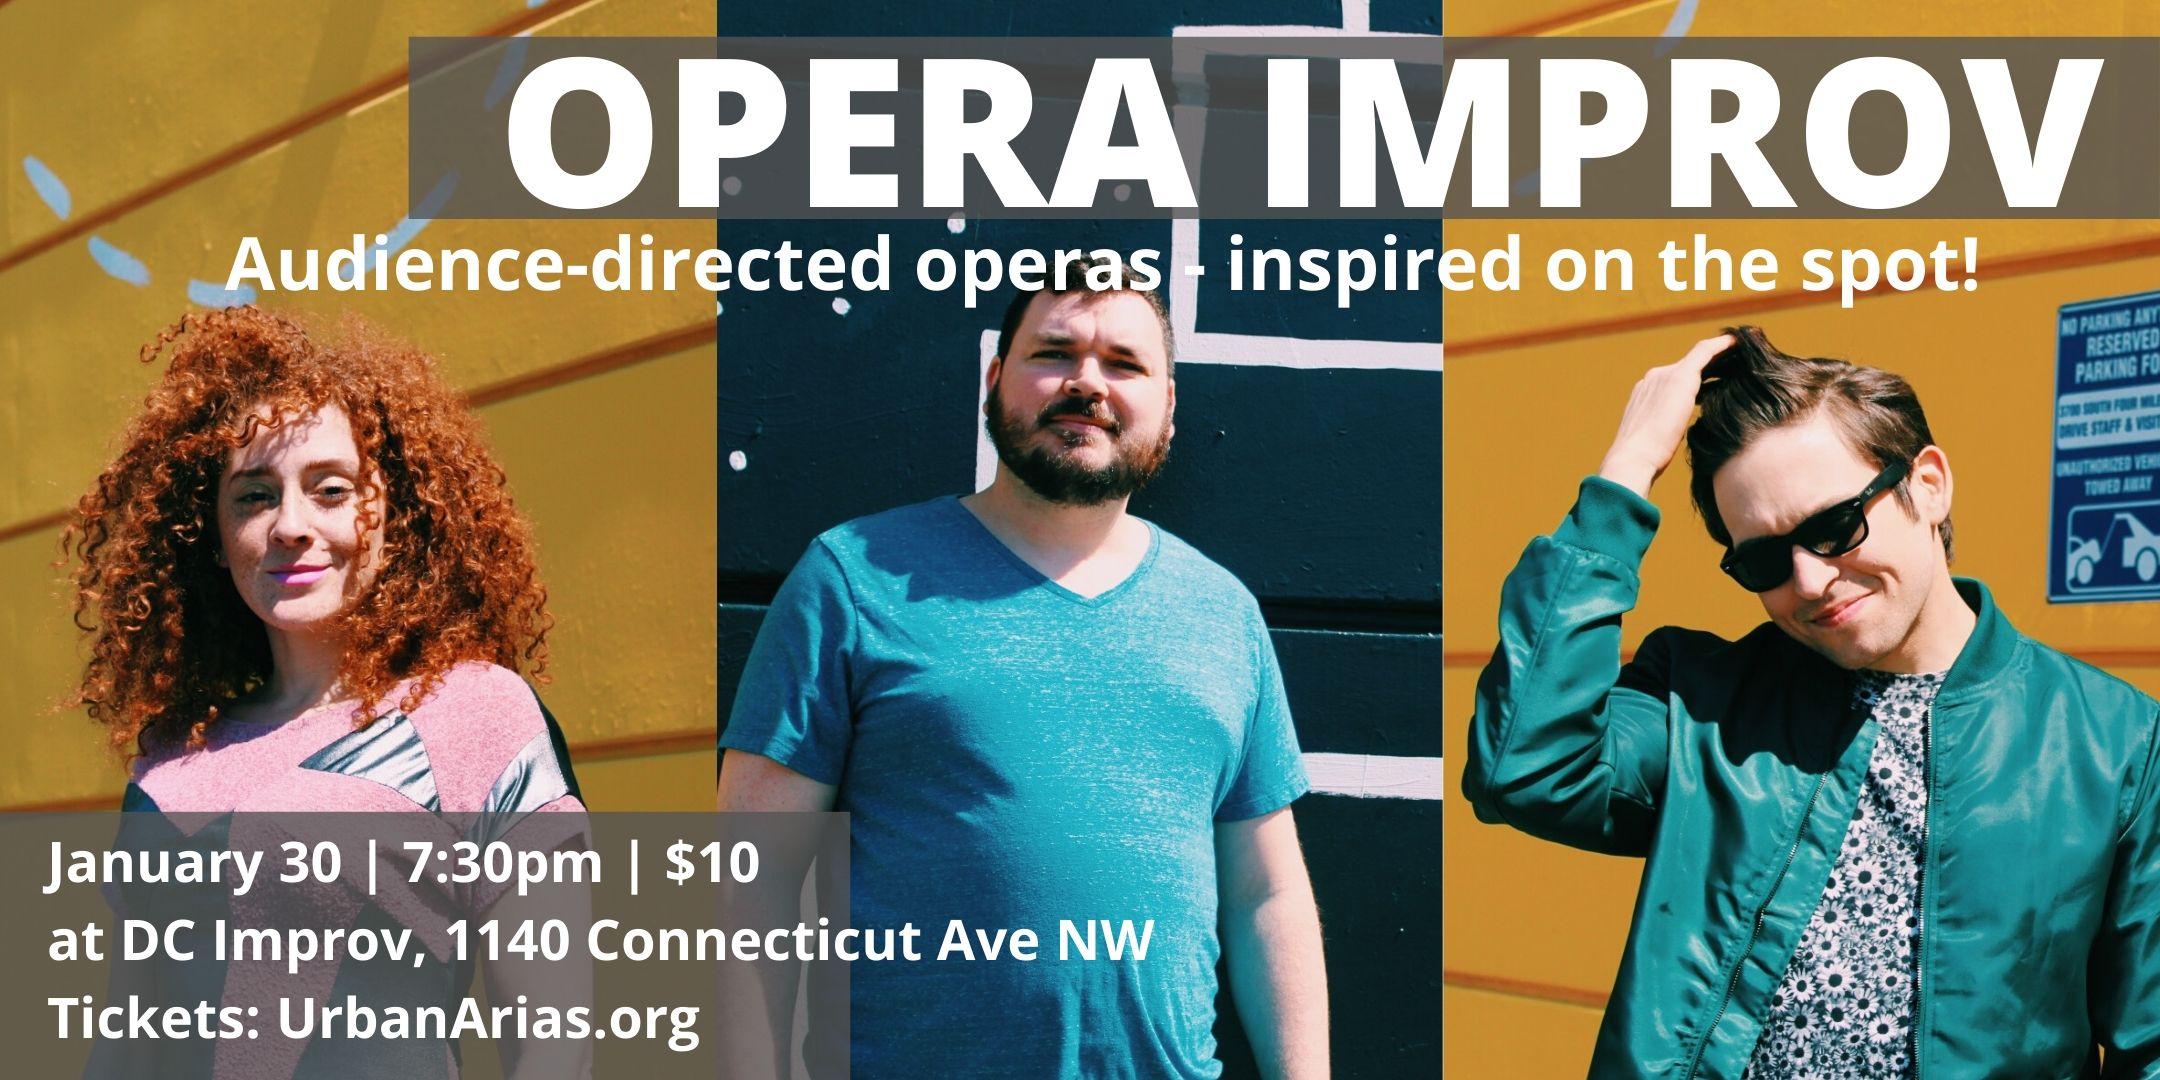 Opera Improv January 30